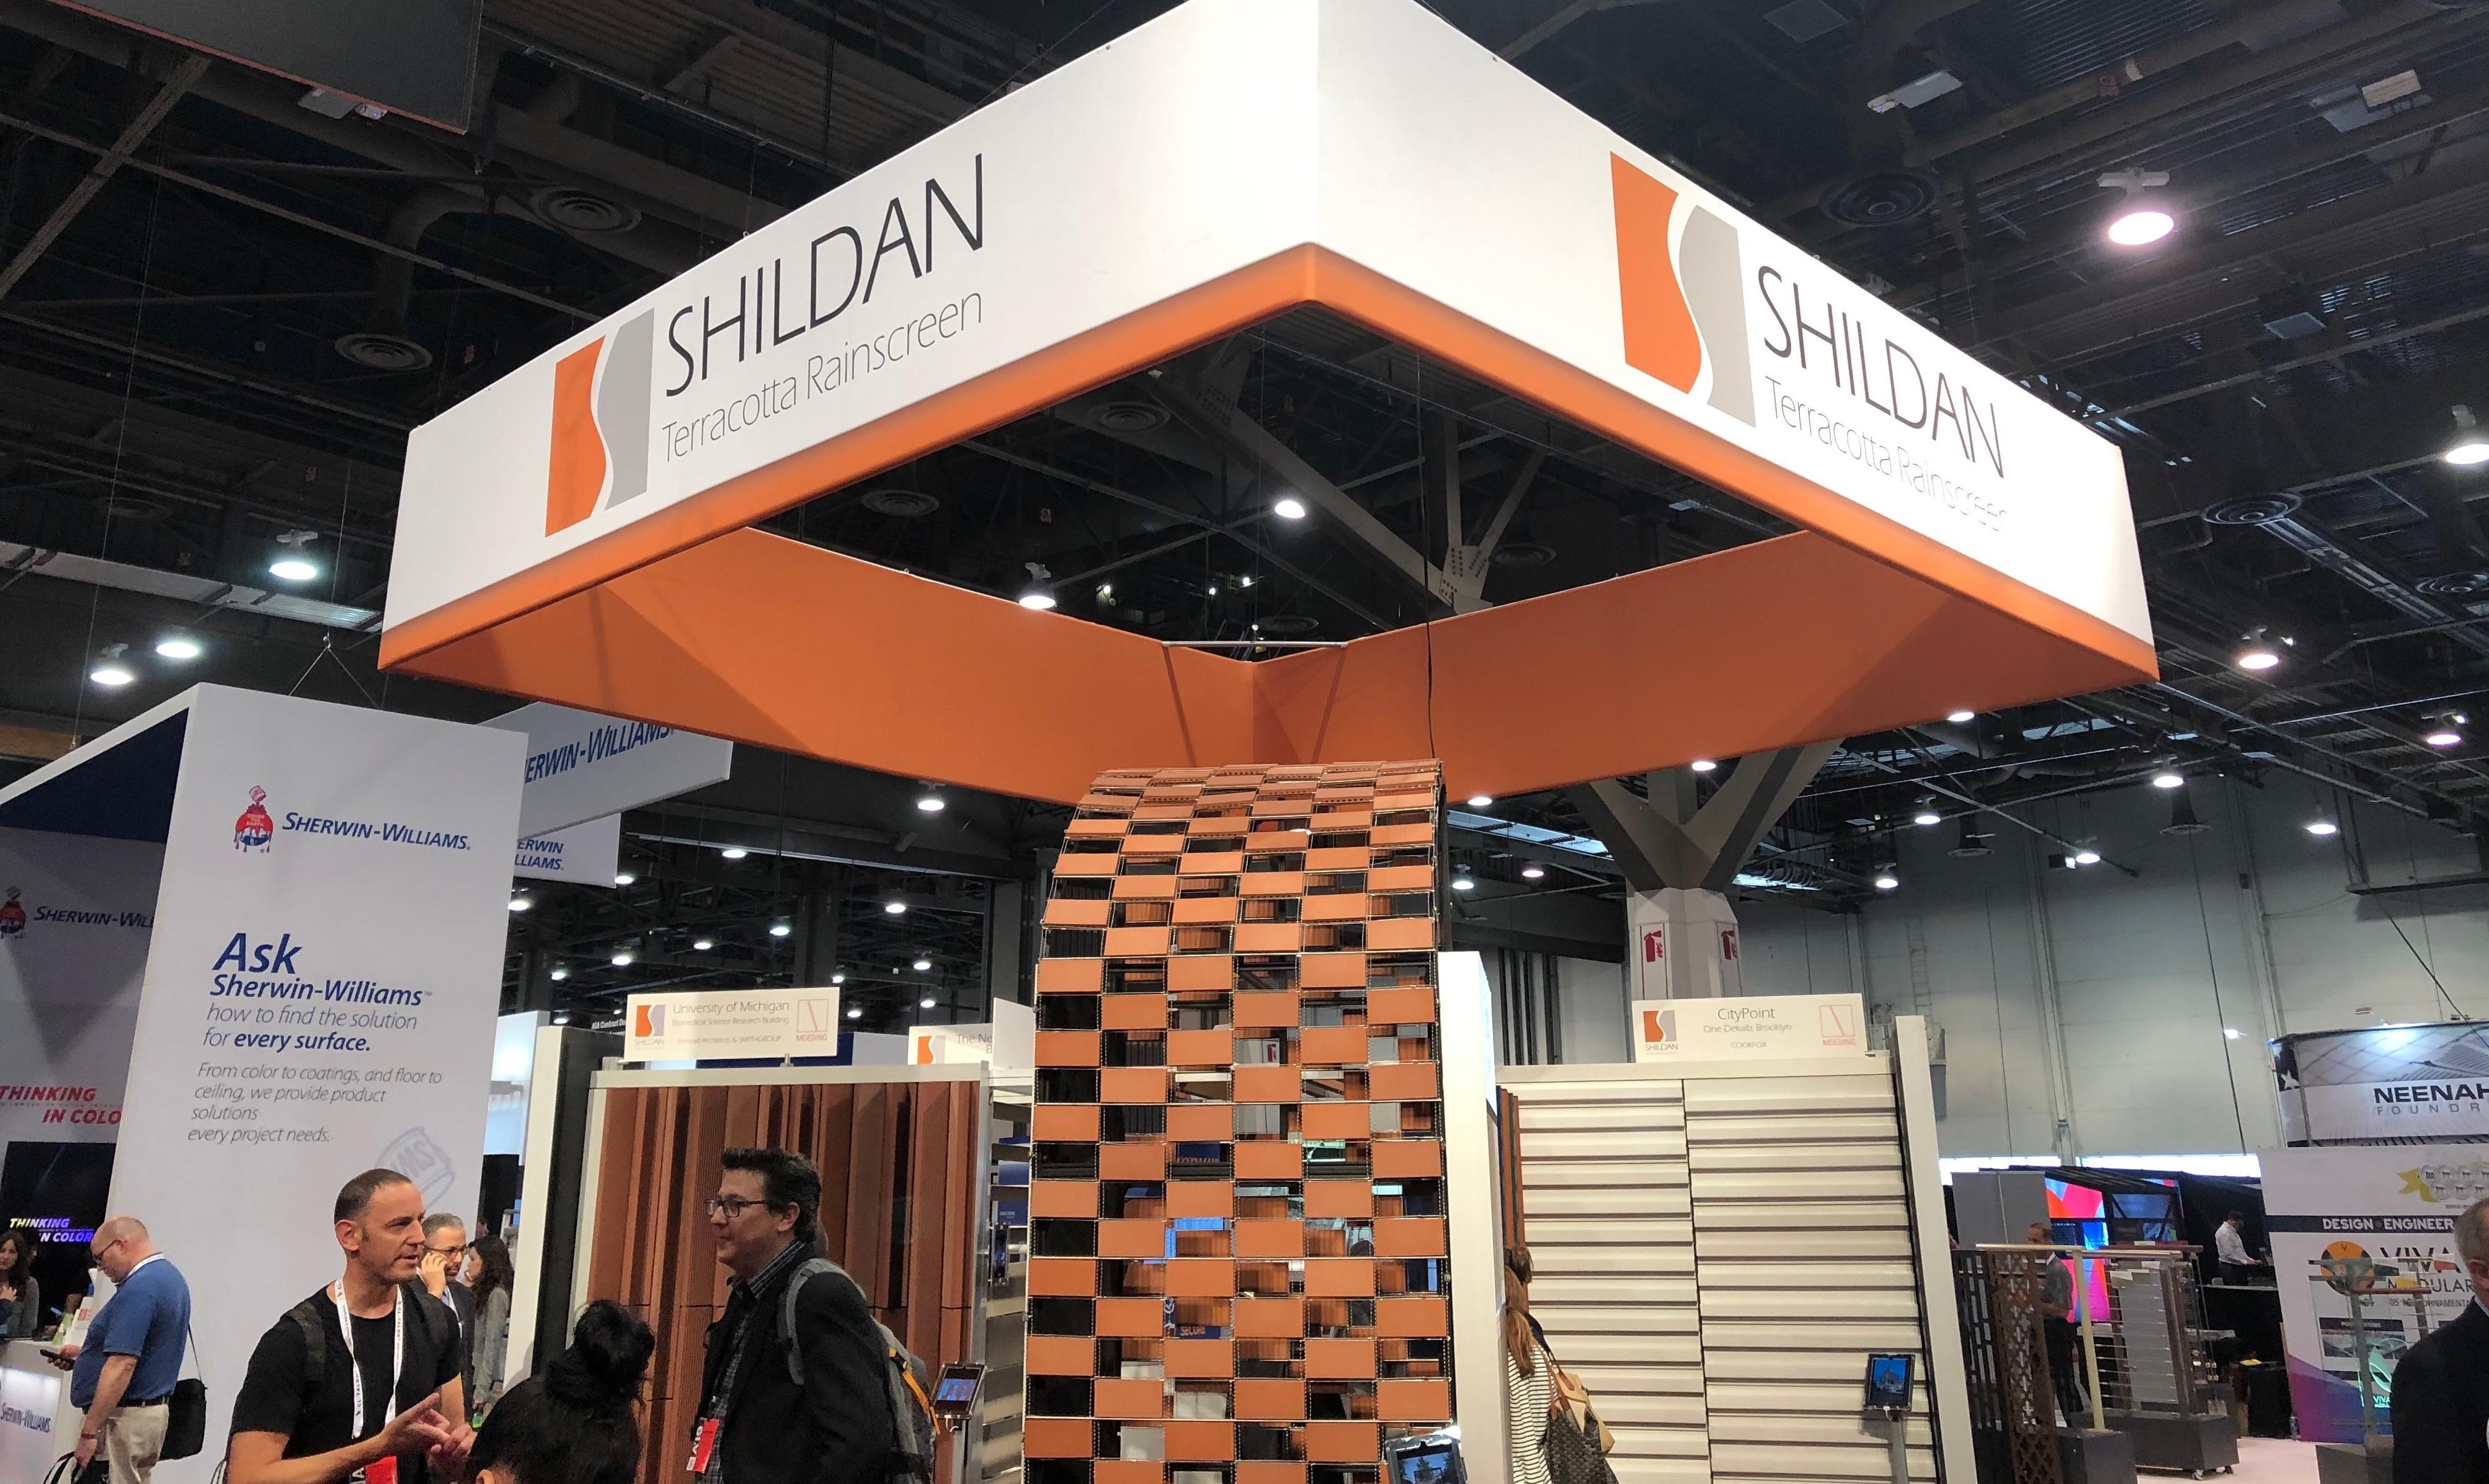 Shildan Booth